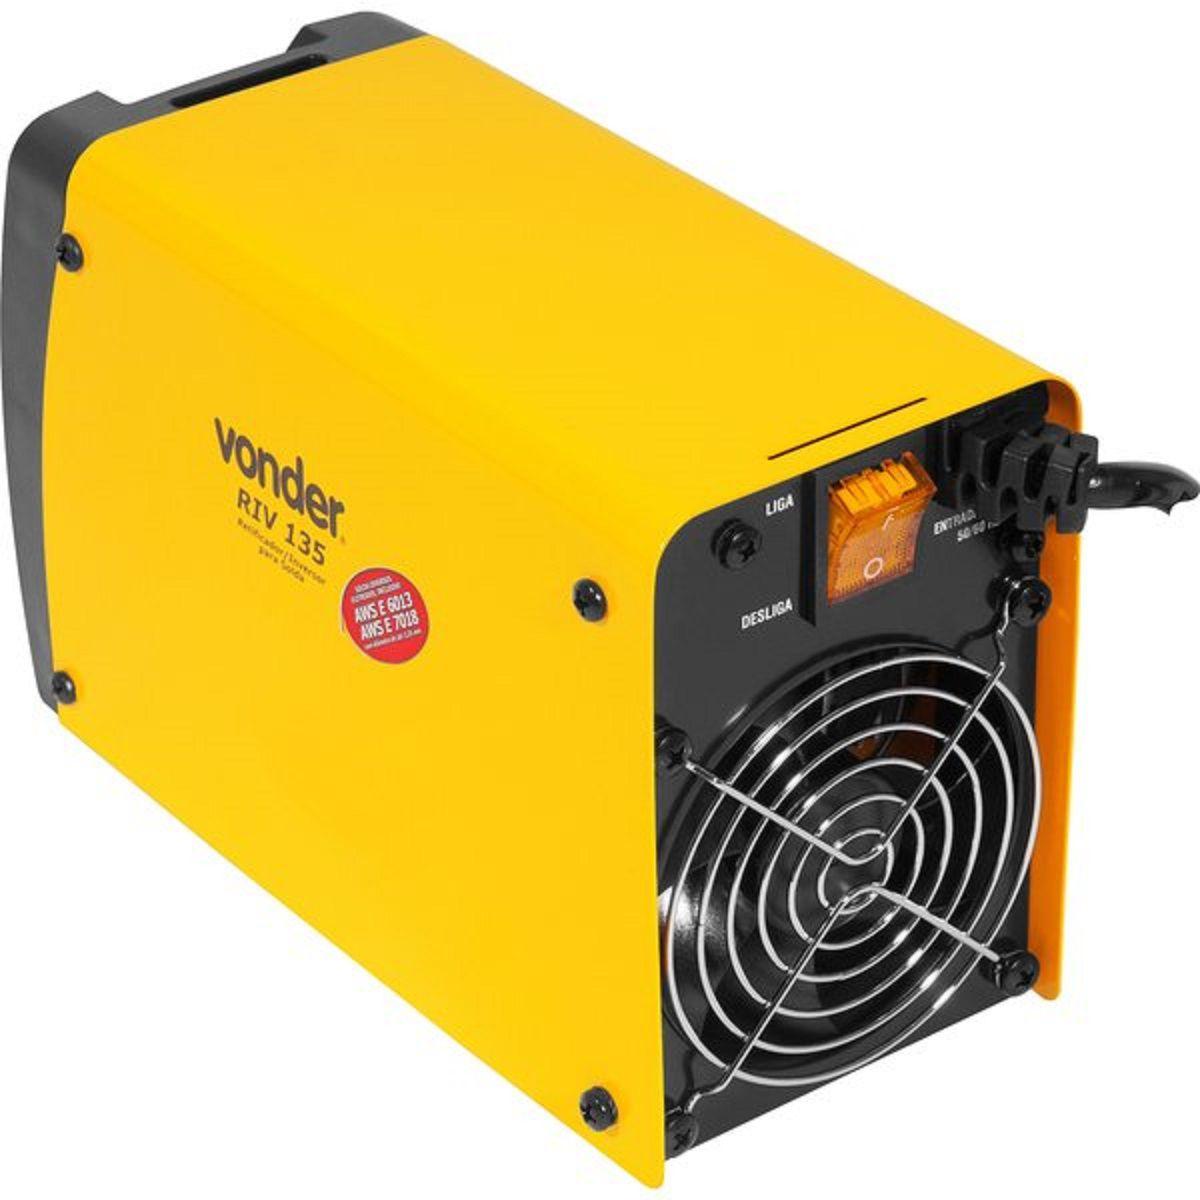 Máquina Retificadora/Inversora de Solda 220v 130A - VONDER-RIV135